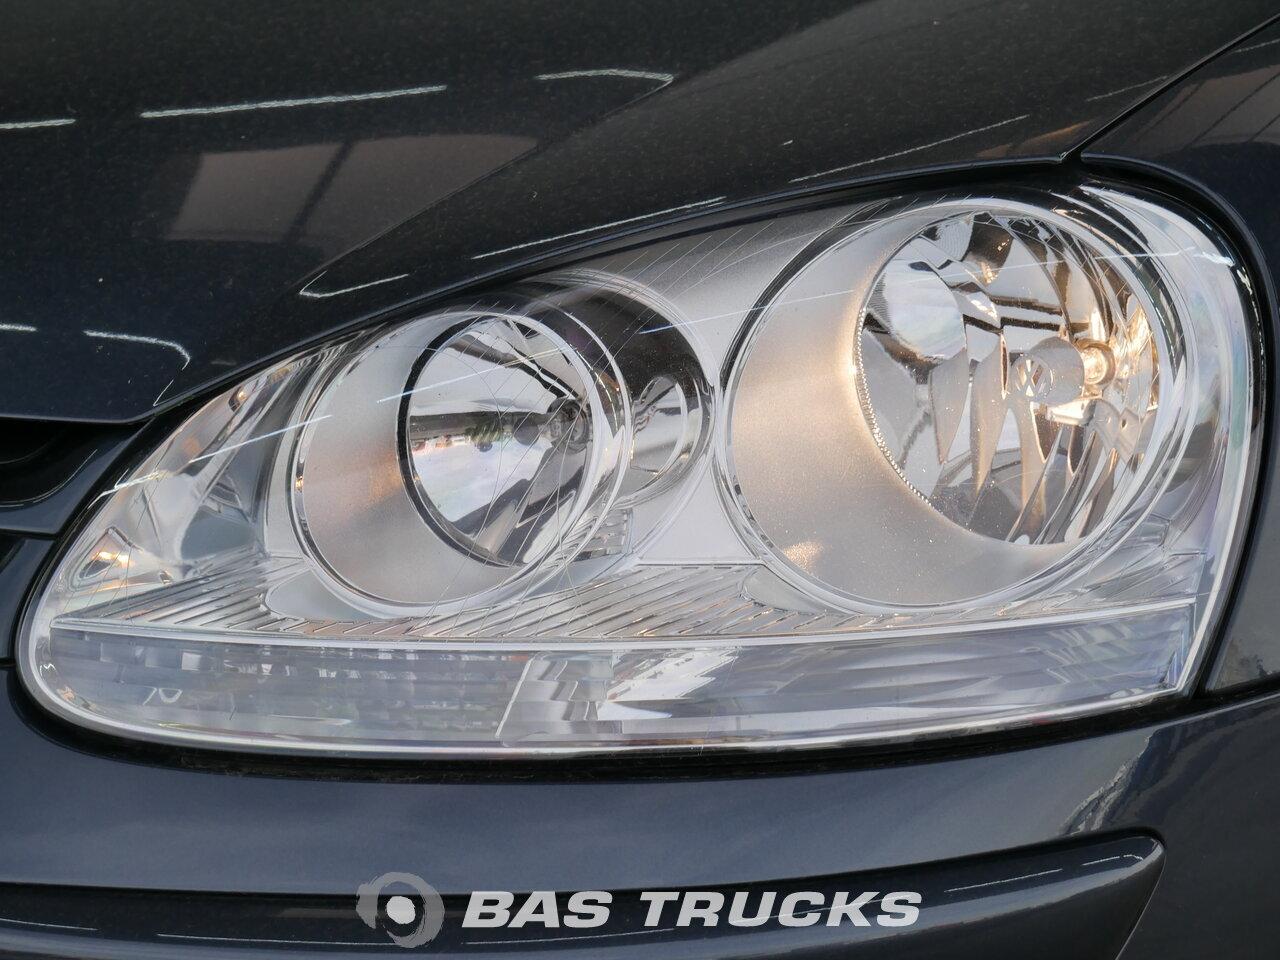 photo de Occasion Voiture Volkswagen Golf 1.9 TDI 2008